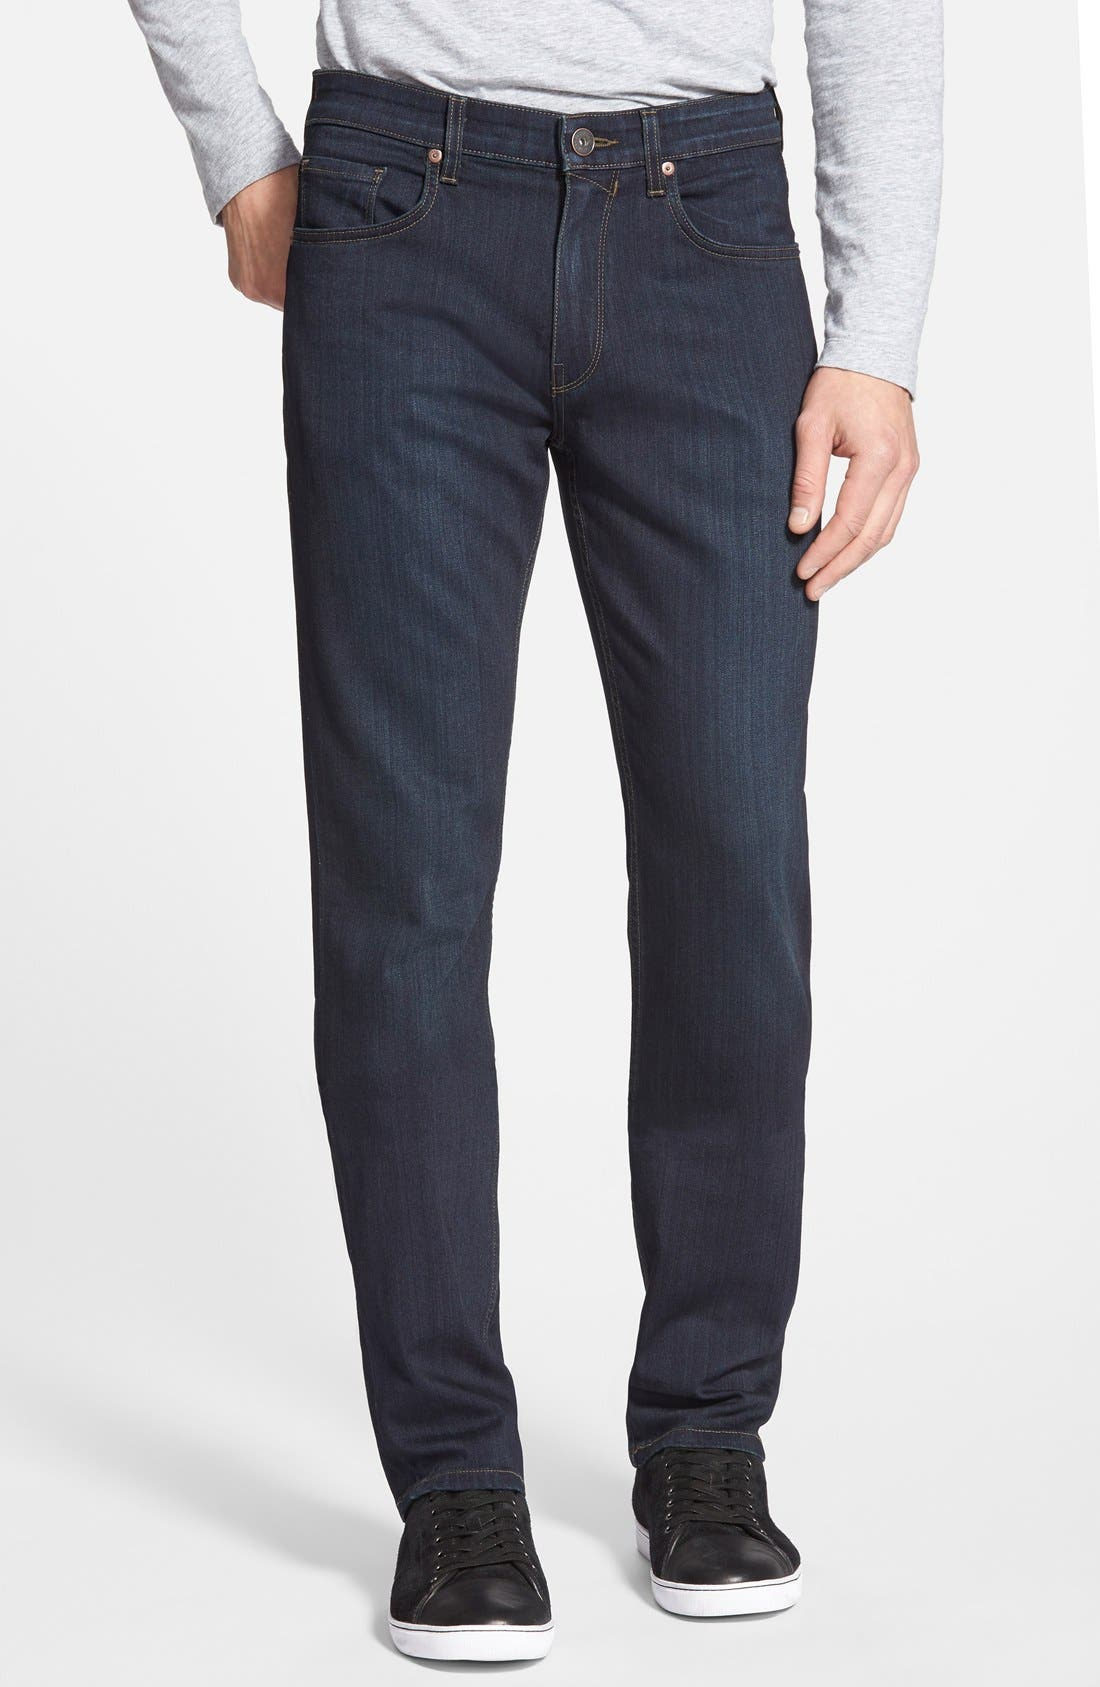 PAIGE Transcend - Federal Slim Straight Leg Jeans, Main, color, CELLAR/ CELLAR